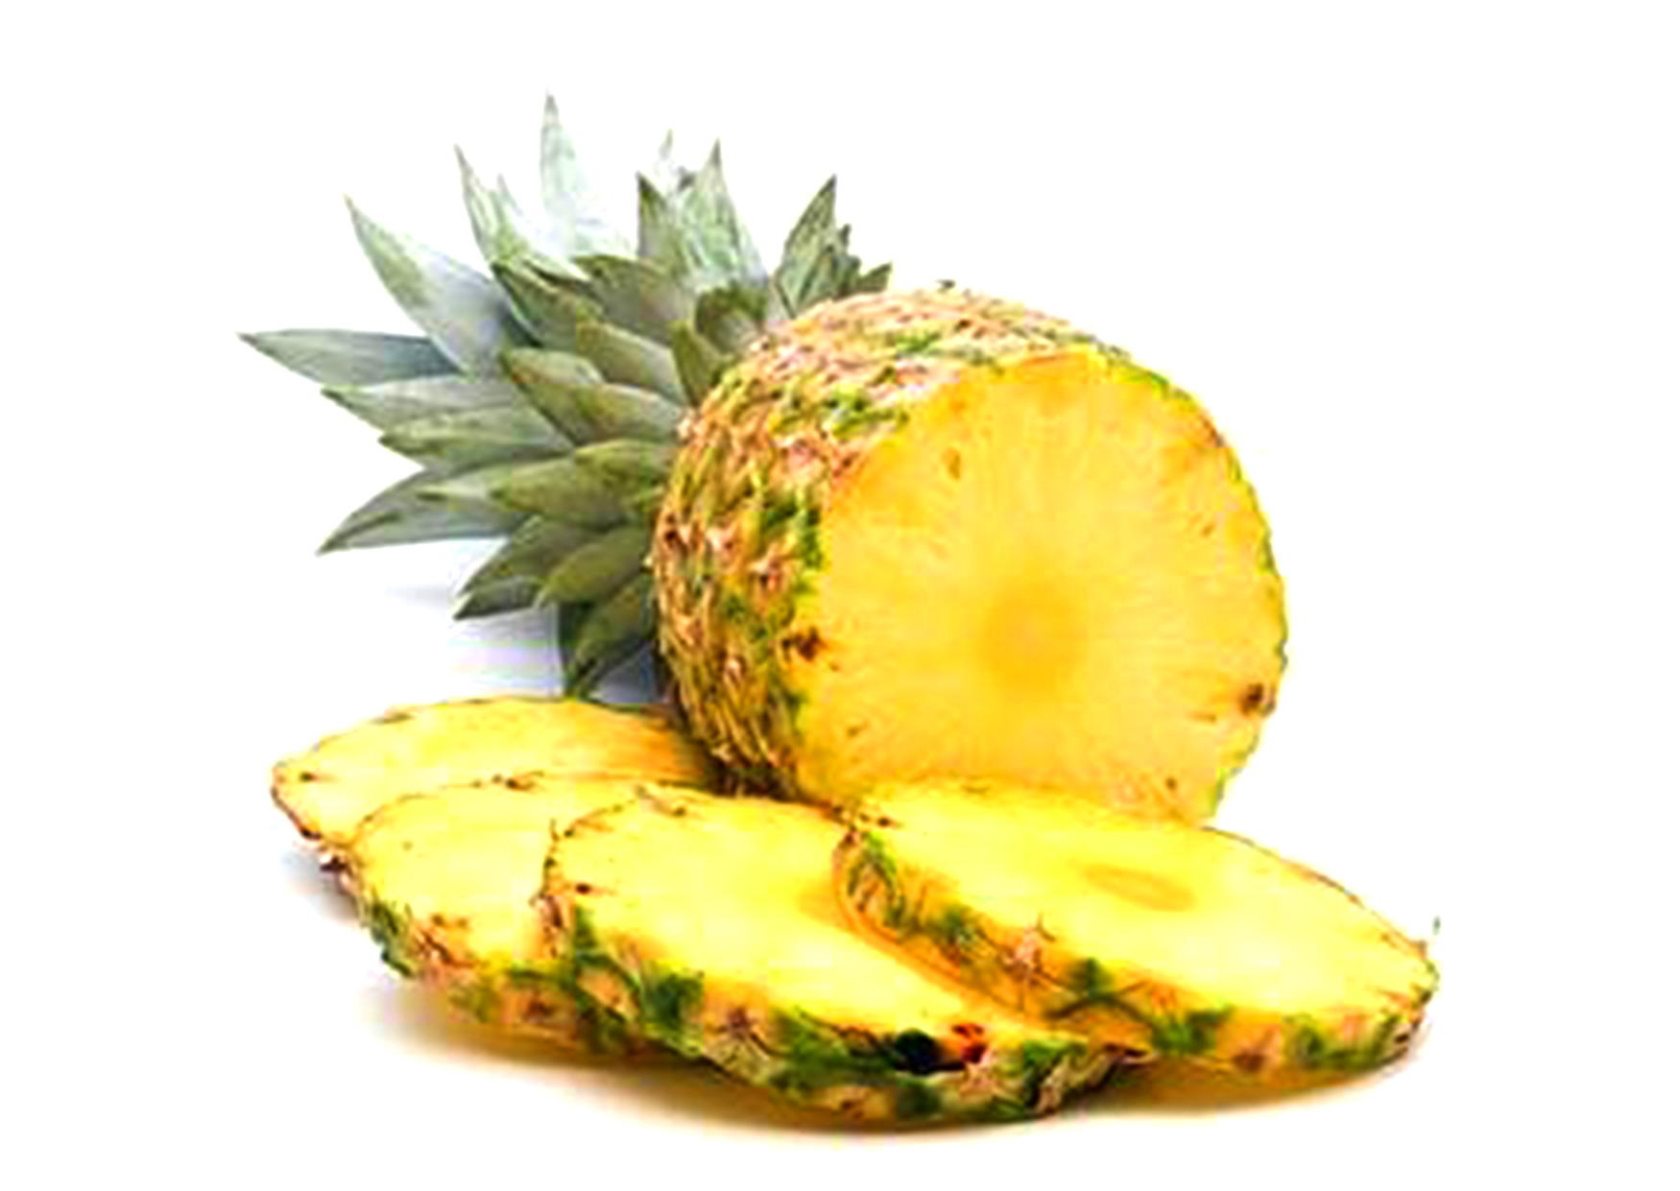 ananas bromelina antinfiammatorio elisabetta salomone